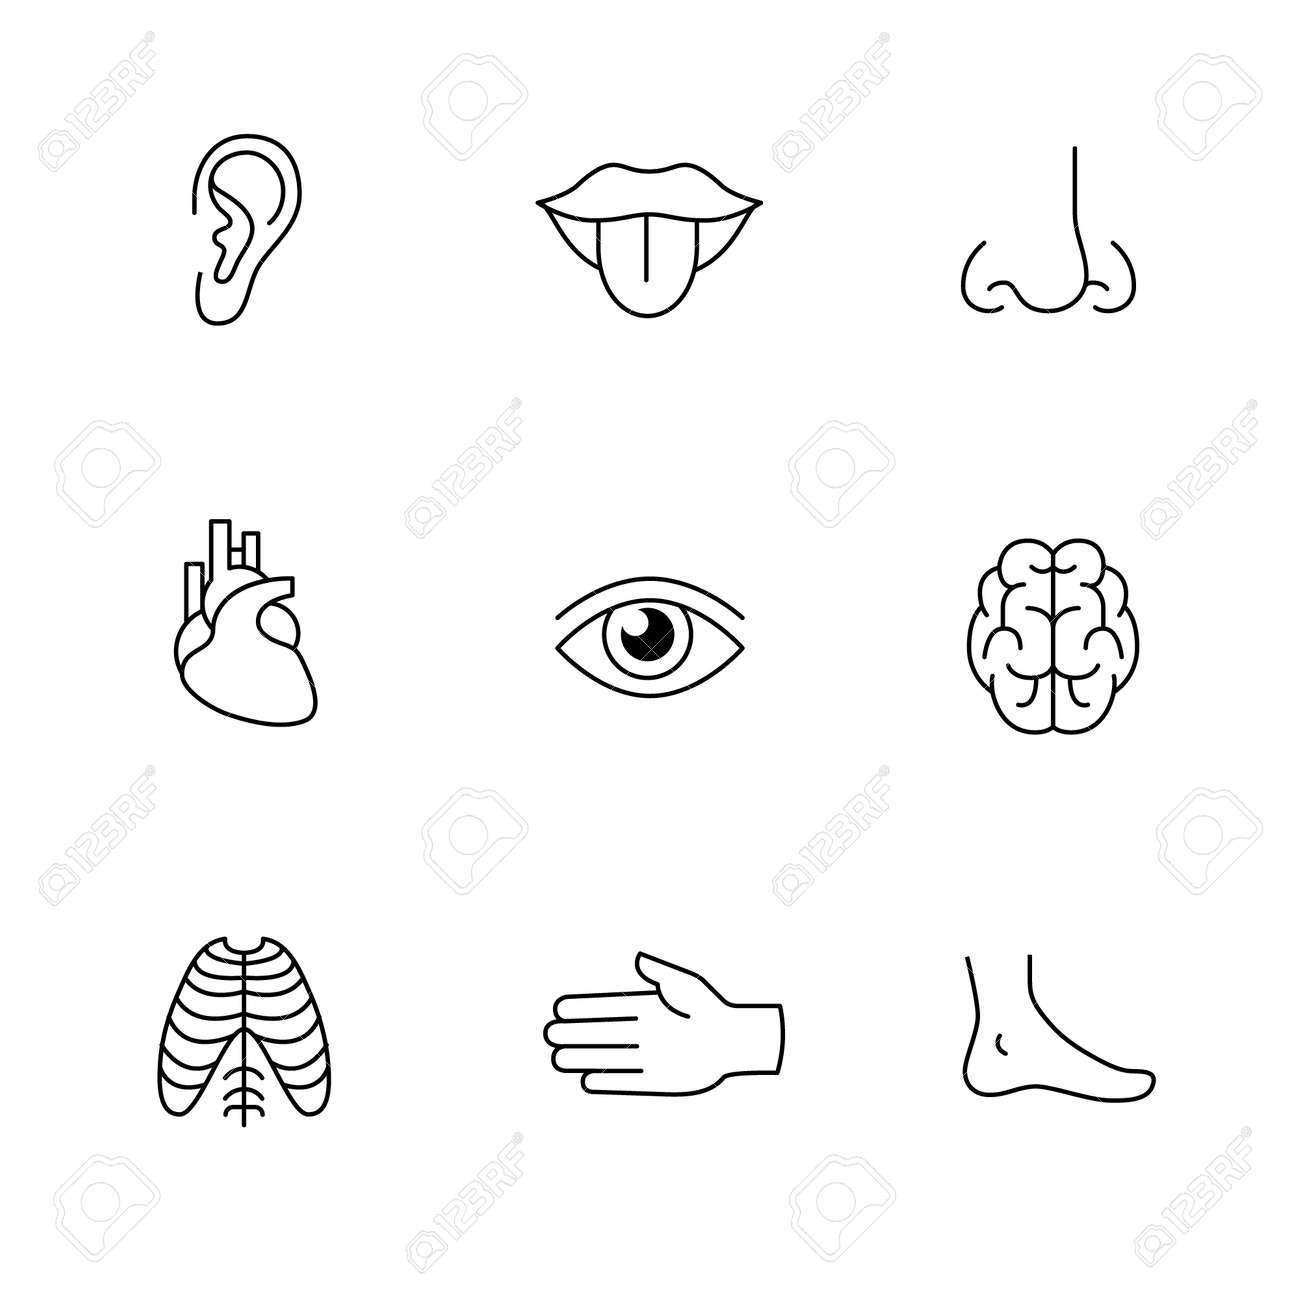 Medical Icons Thin Line Art Set Human Organs Senses And Body Royalty Free Cliparts Vectors And Stock Illustration Image 52949118